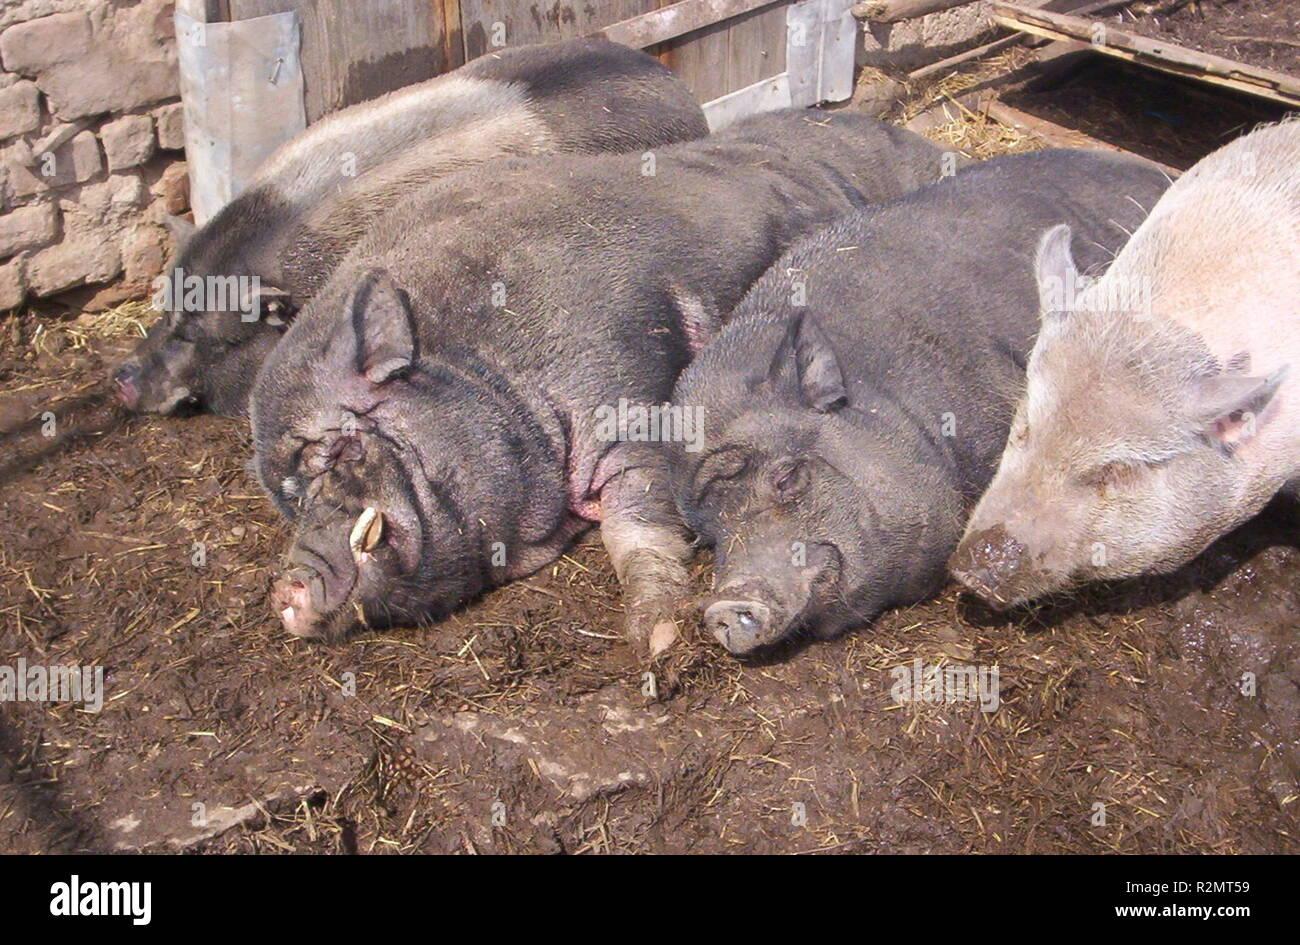 sleeping pig - Stock Image